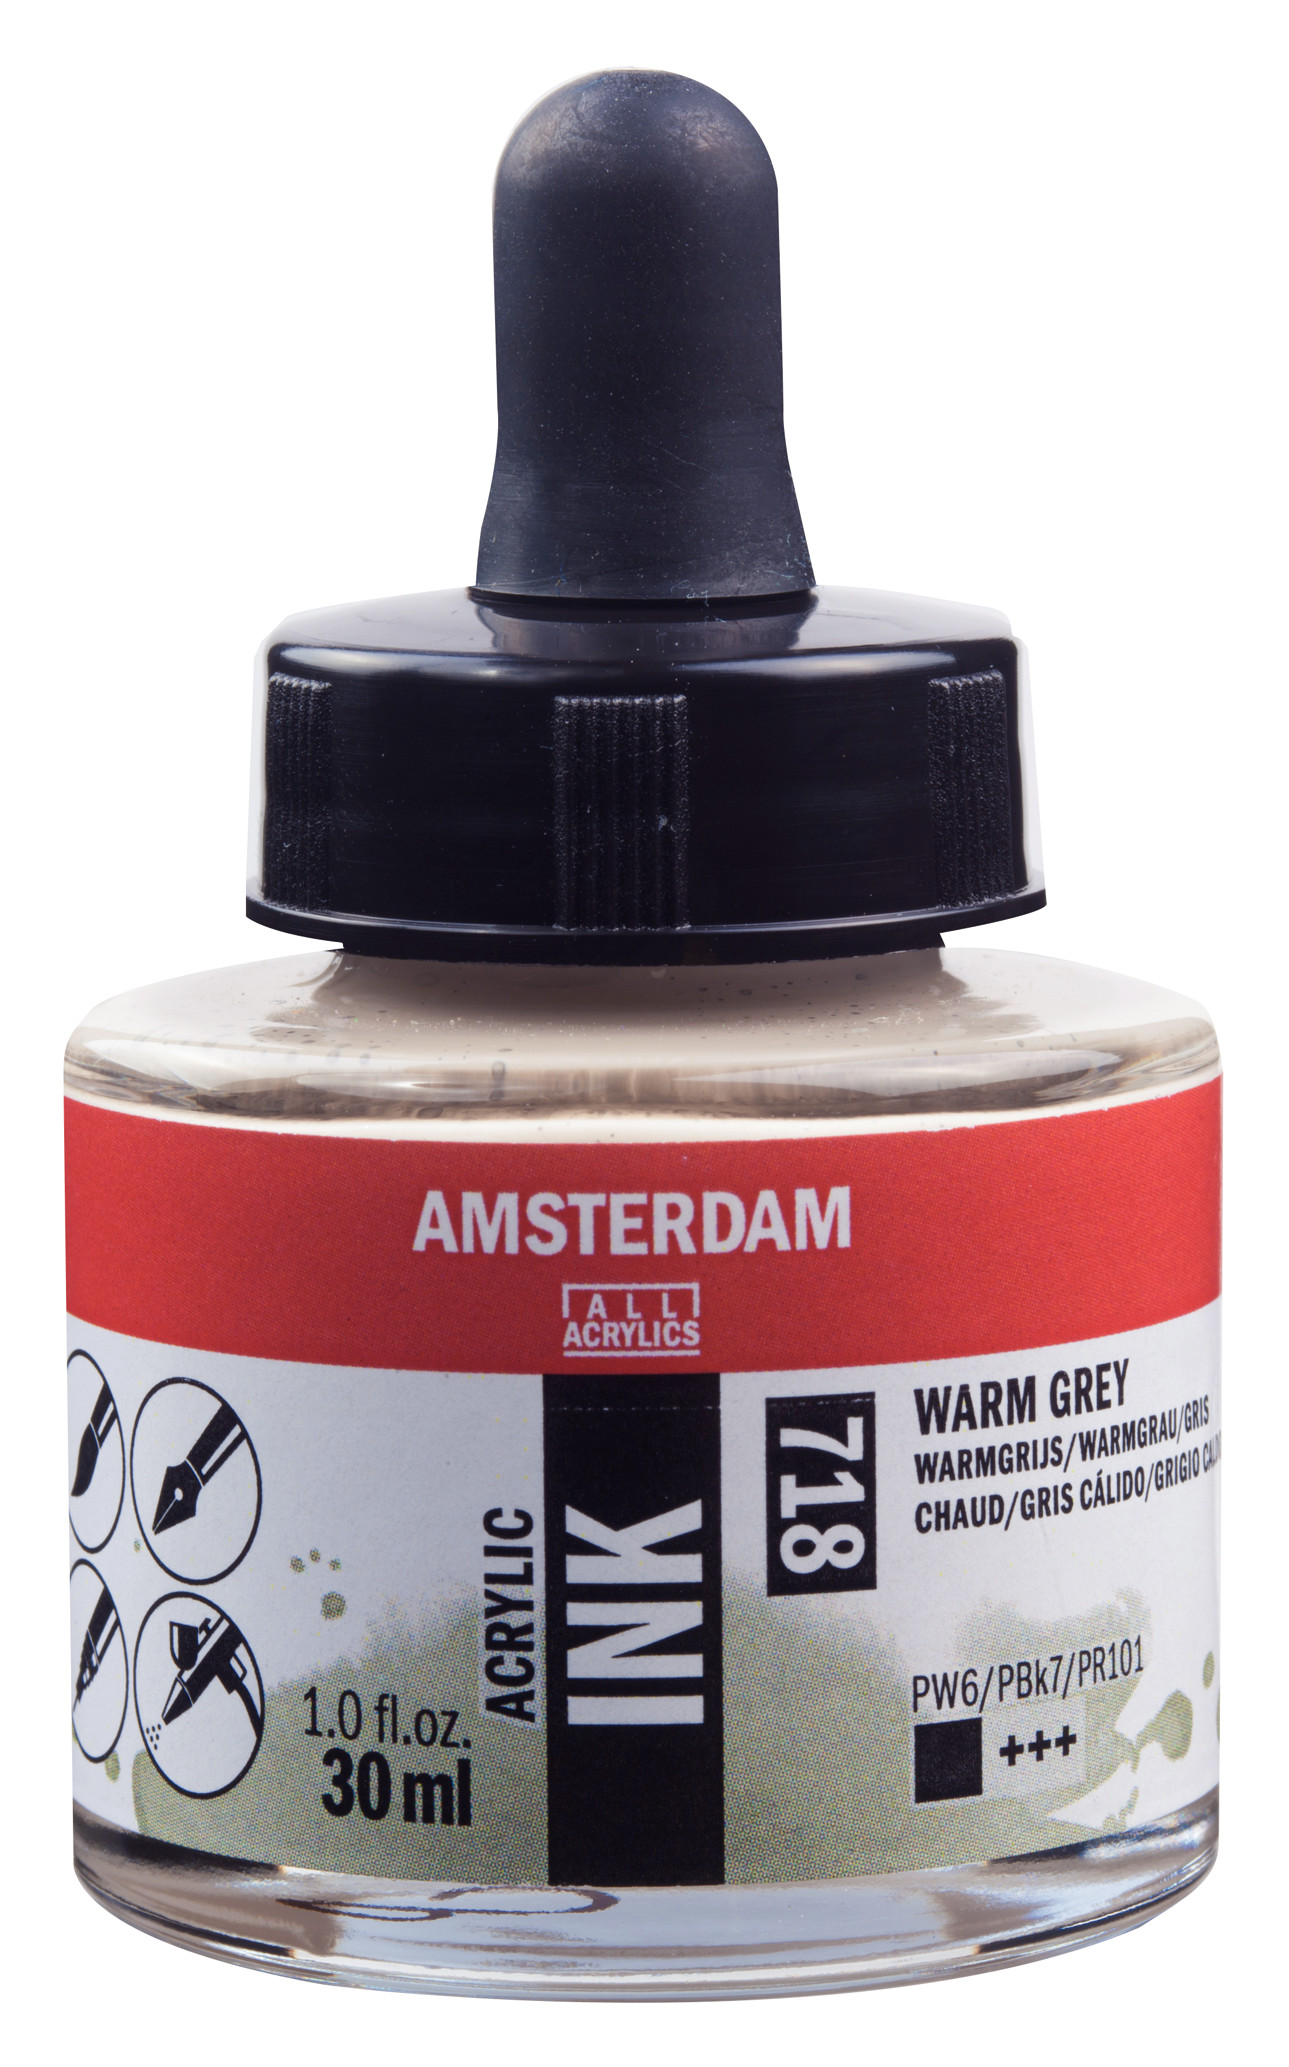 Amsterdam Acrylic Ink Bottle 30 ml Warm Grey 718